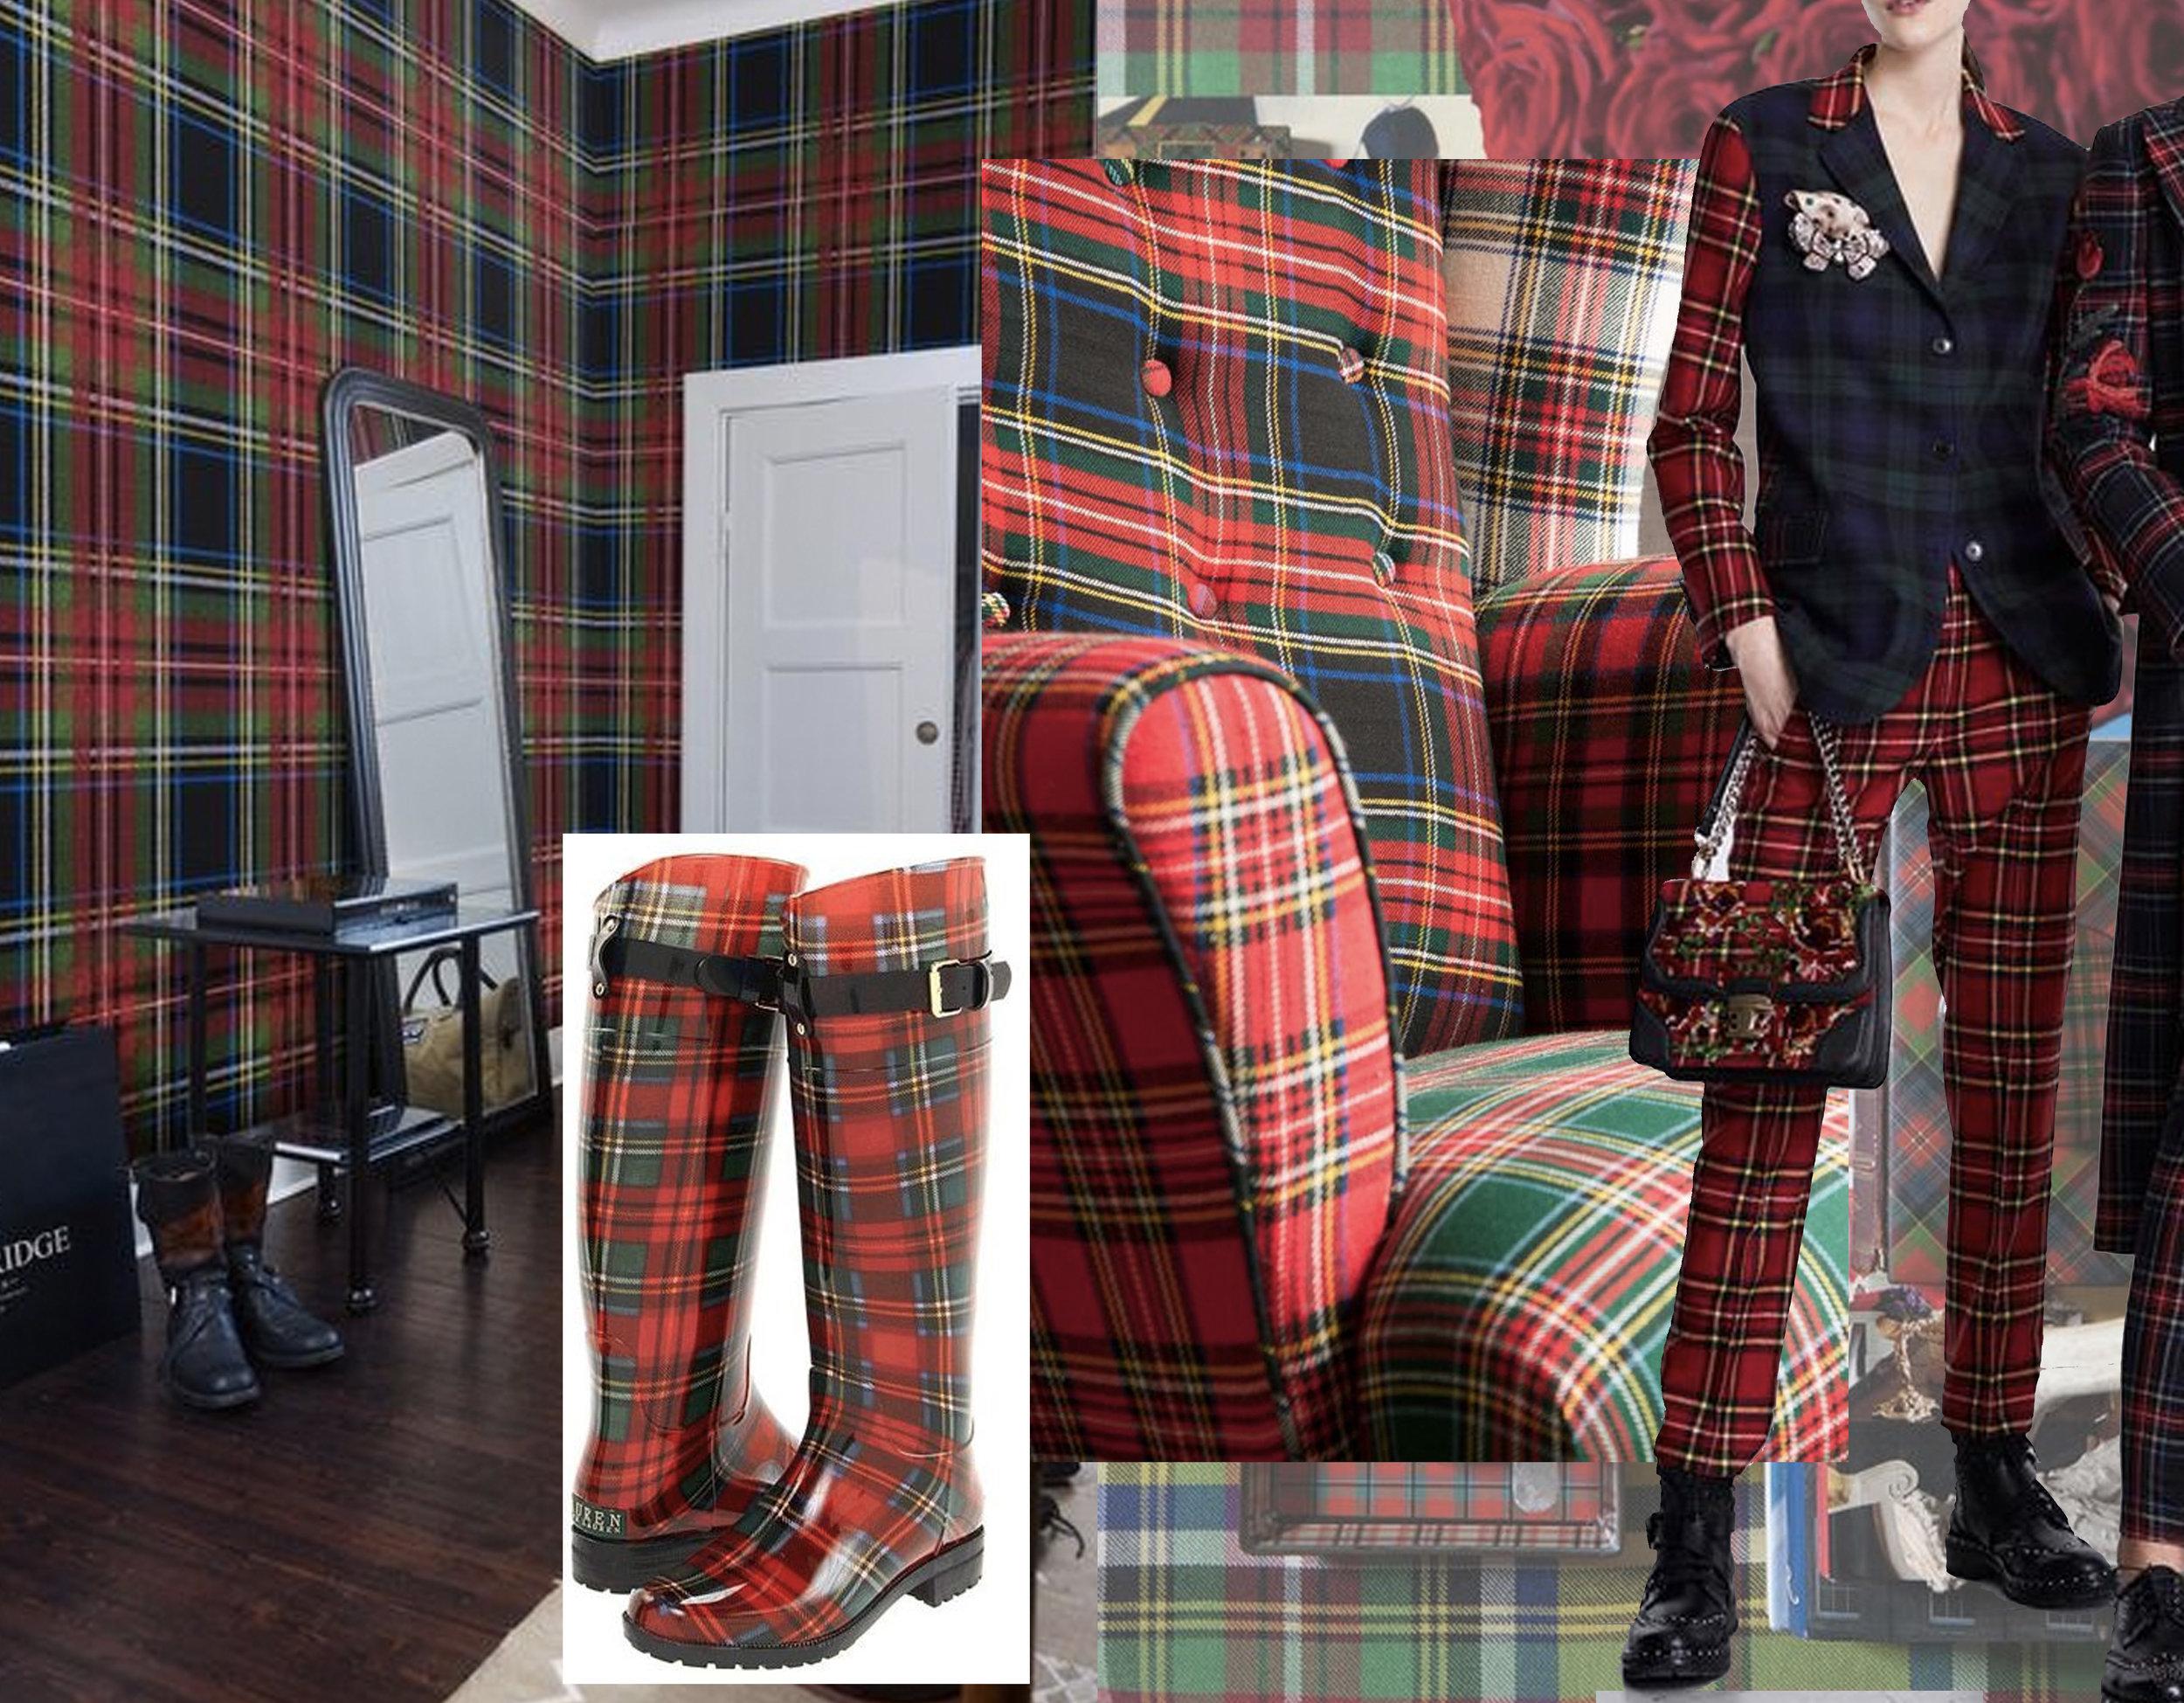 plaid wallpaper via  Laura Casey - rain boots  Amazon  - vintage tartan wingback chair via Philips & Cheers - fashion image Ermanno Scervino via  WWD